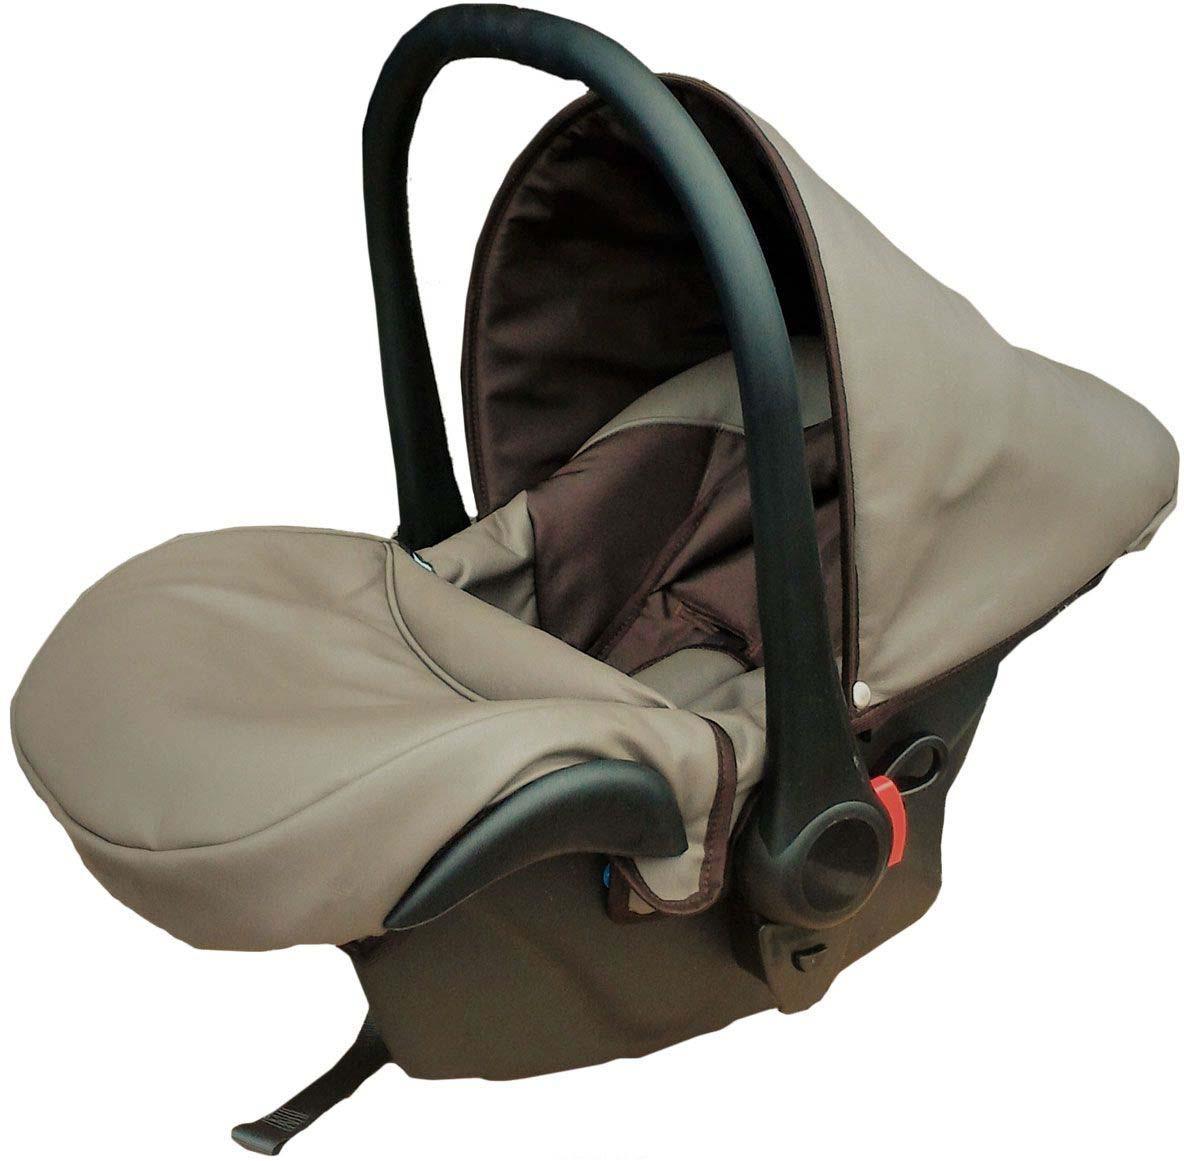 Автокресло Lonex Premium от 0 до 13 кг, F-08_ECCO, grey